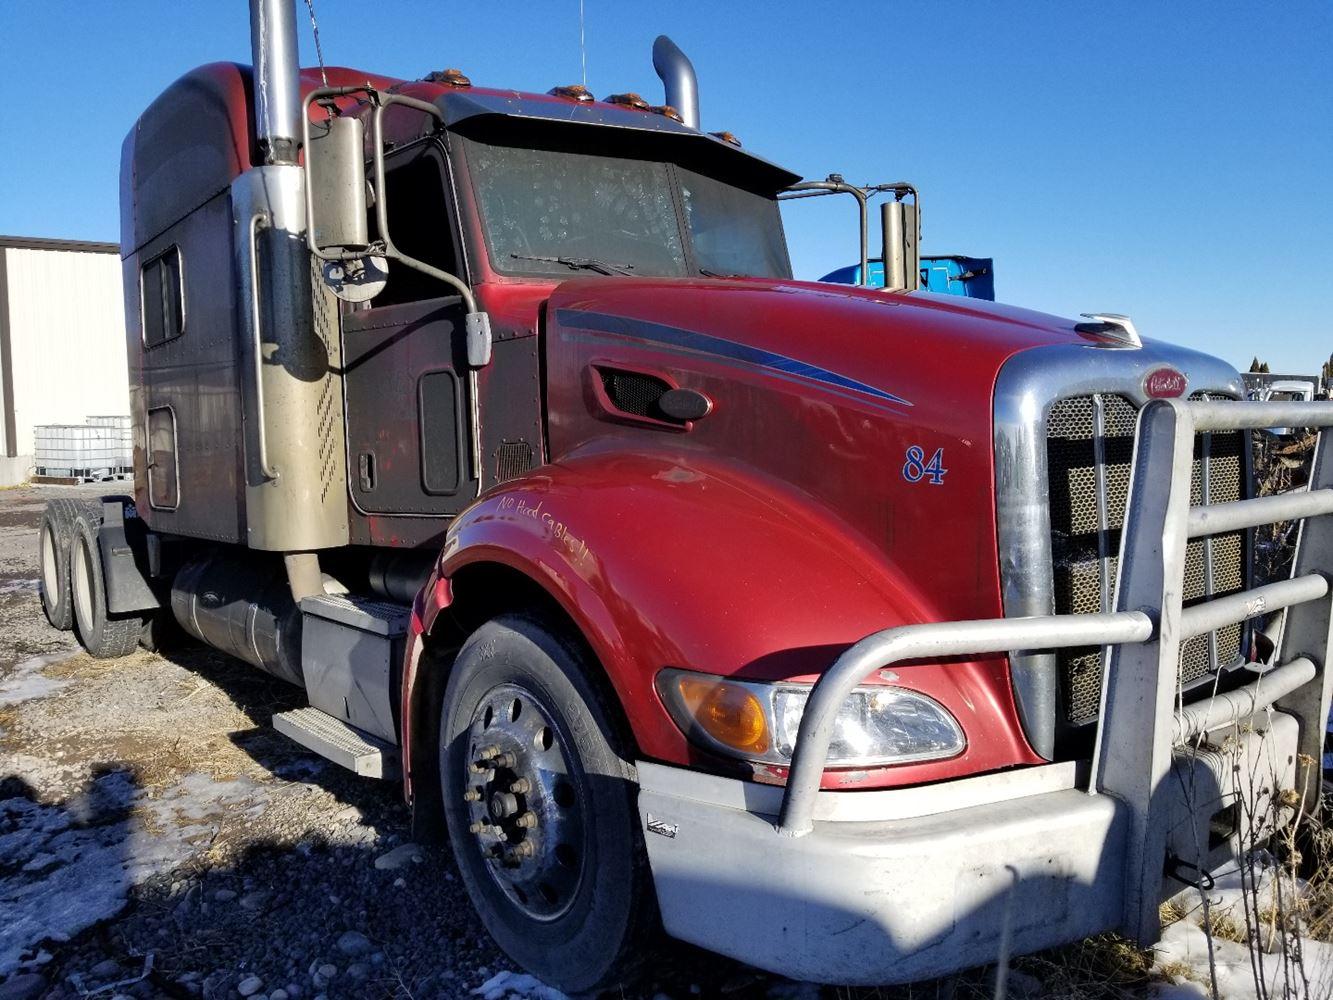 2009 Peterbilt 386 Exhaust Pipe Parts aPUBLkSHcpML_f?width=200 exhaust systems holst truck parts